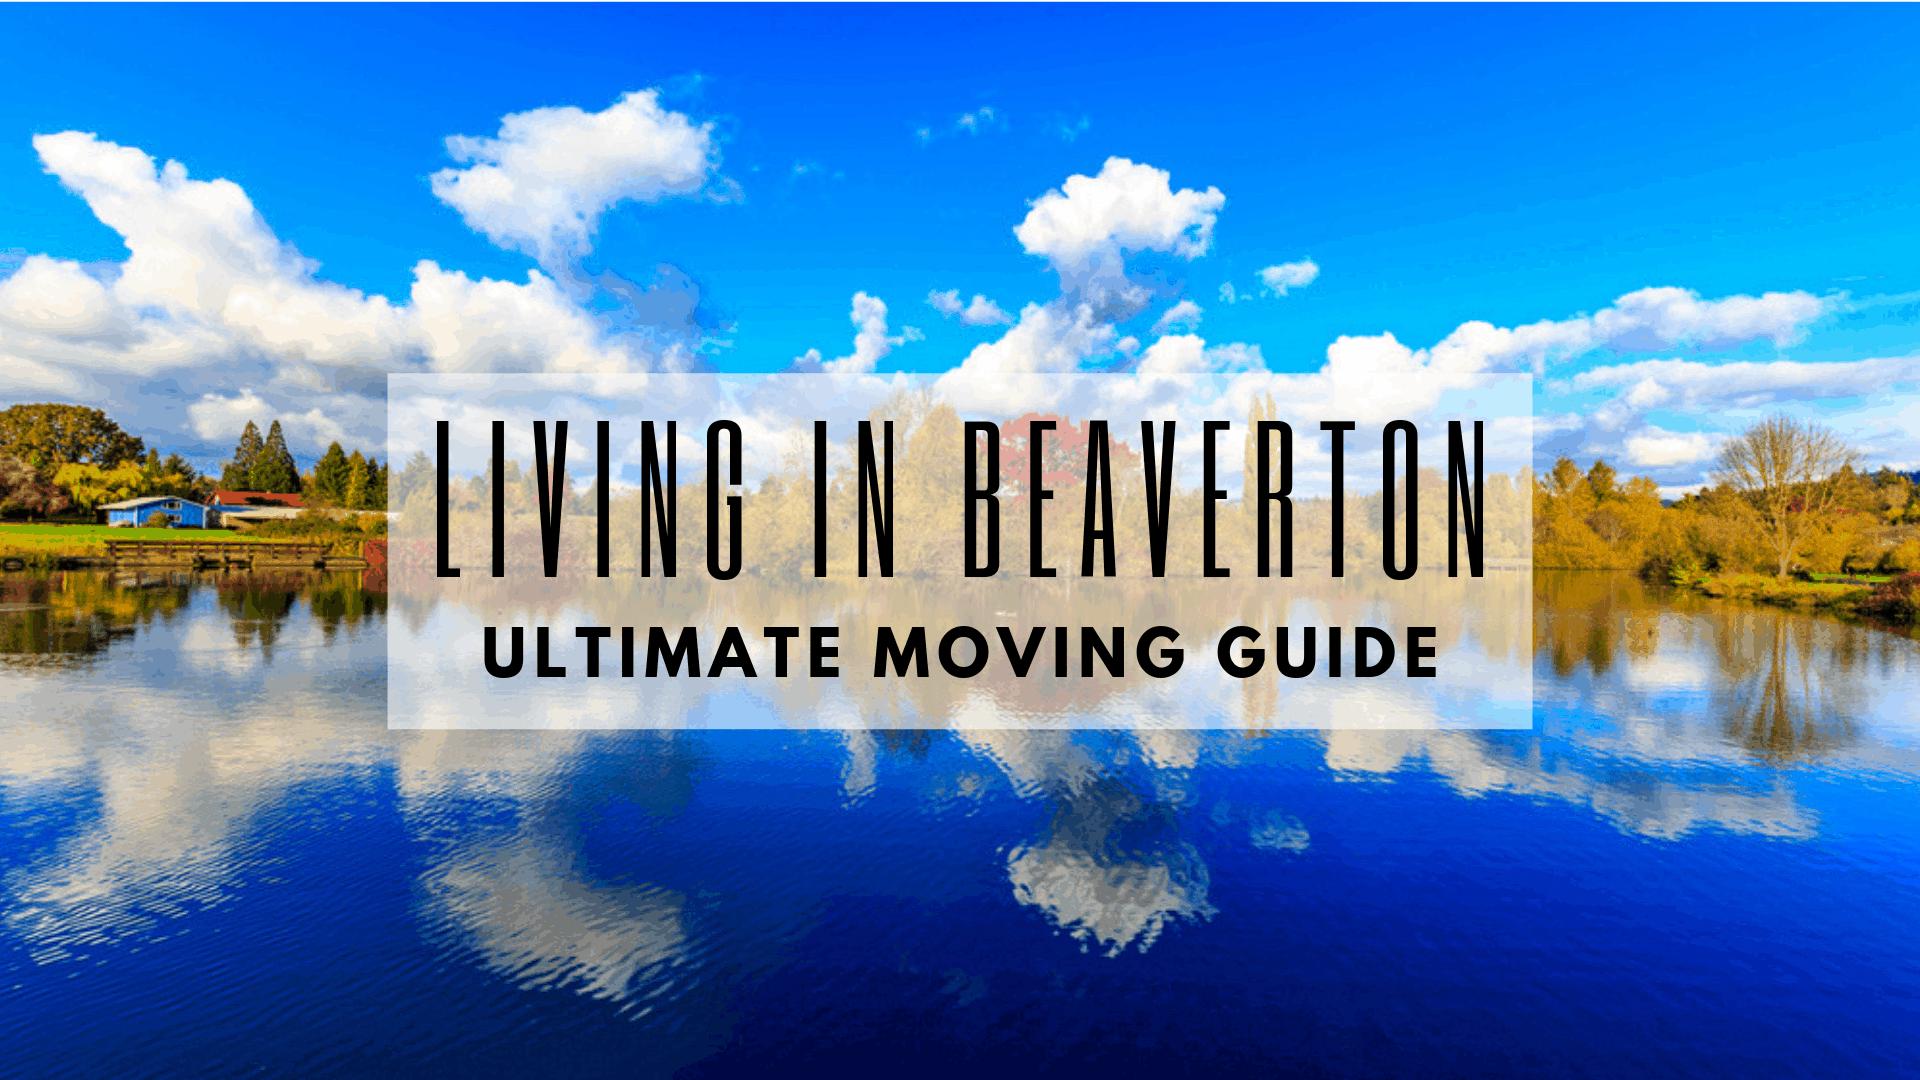 Living in Beaverton, OR - Ultimate Moving to Beaverton Guide